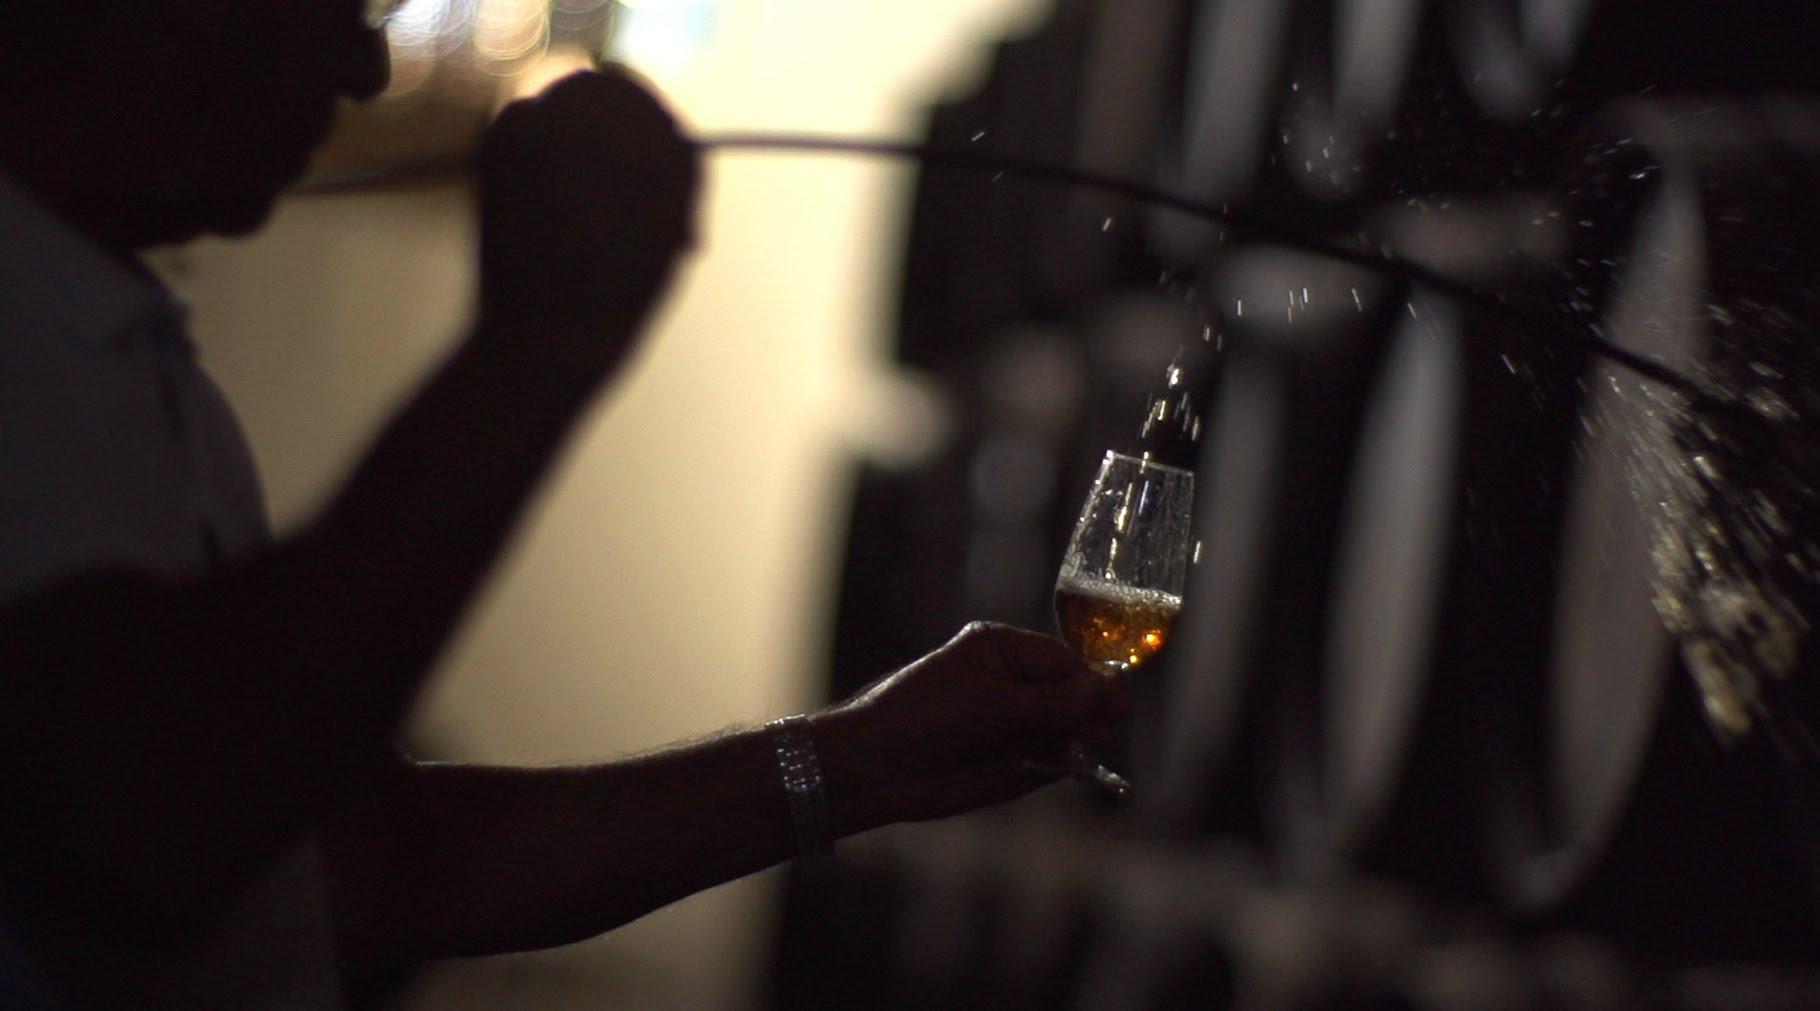 Canasta 20, nuevo vino de jerez de Williams & Humbert